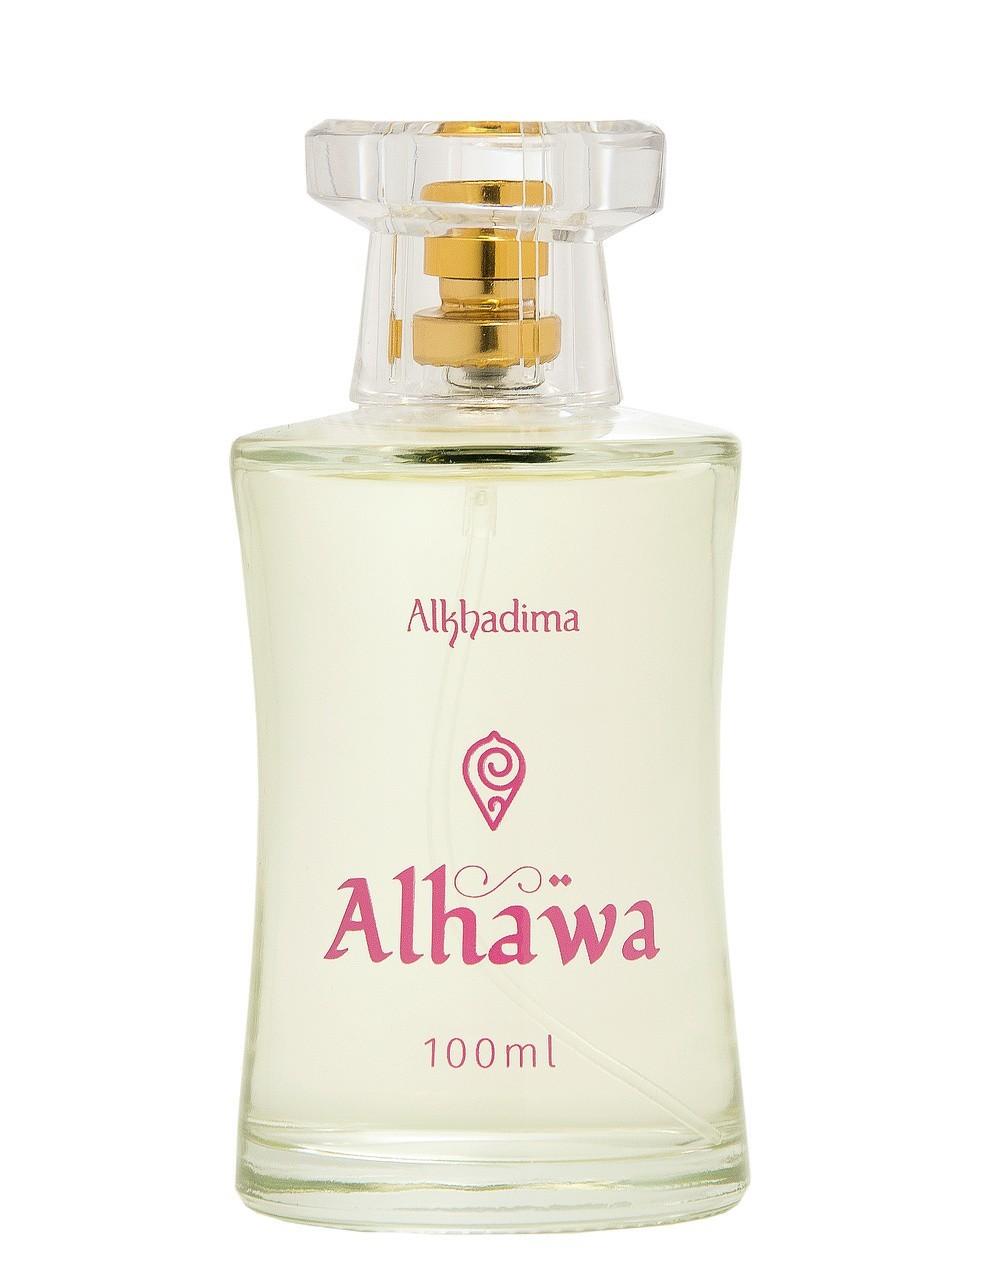 Alhawa - Jasmim, Fava Tonka e Sândalo 100ml